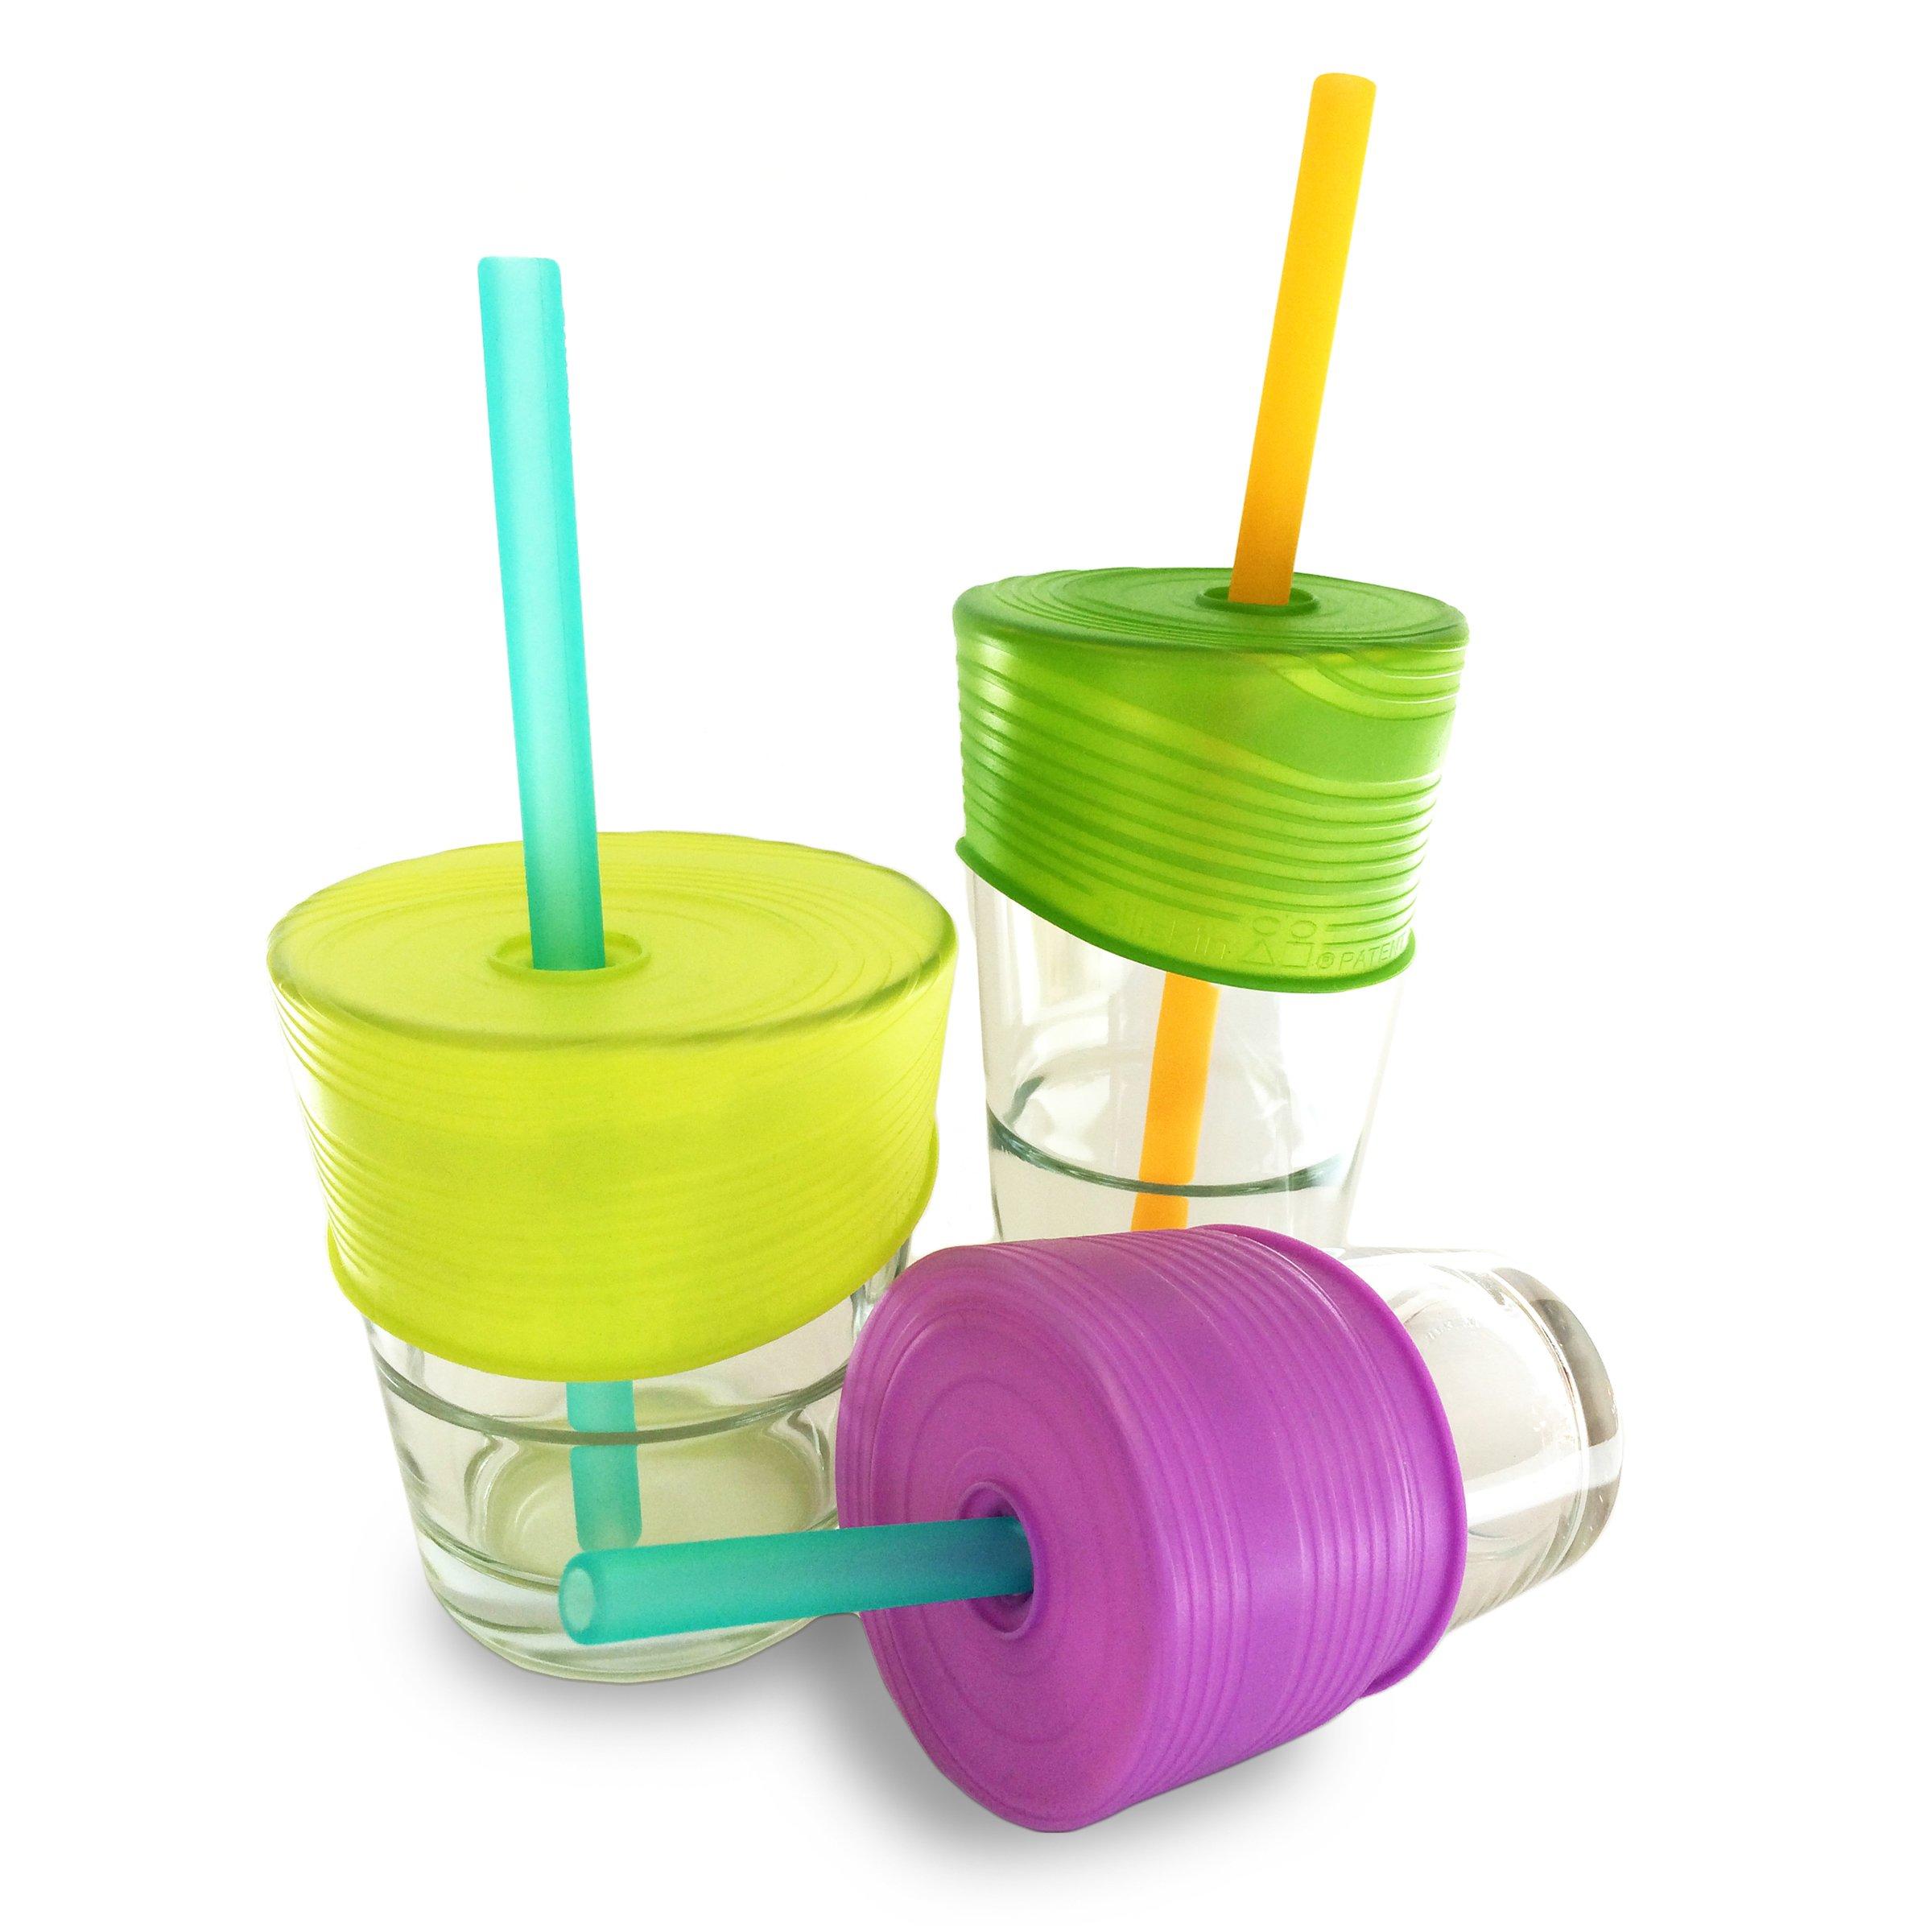 Silikids Siliskin Silicone Straw Tops, Lime/Green/Purple